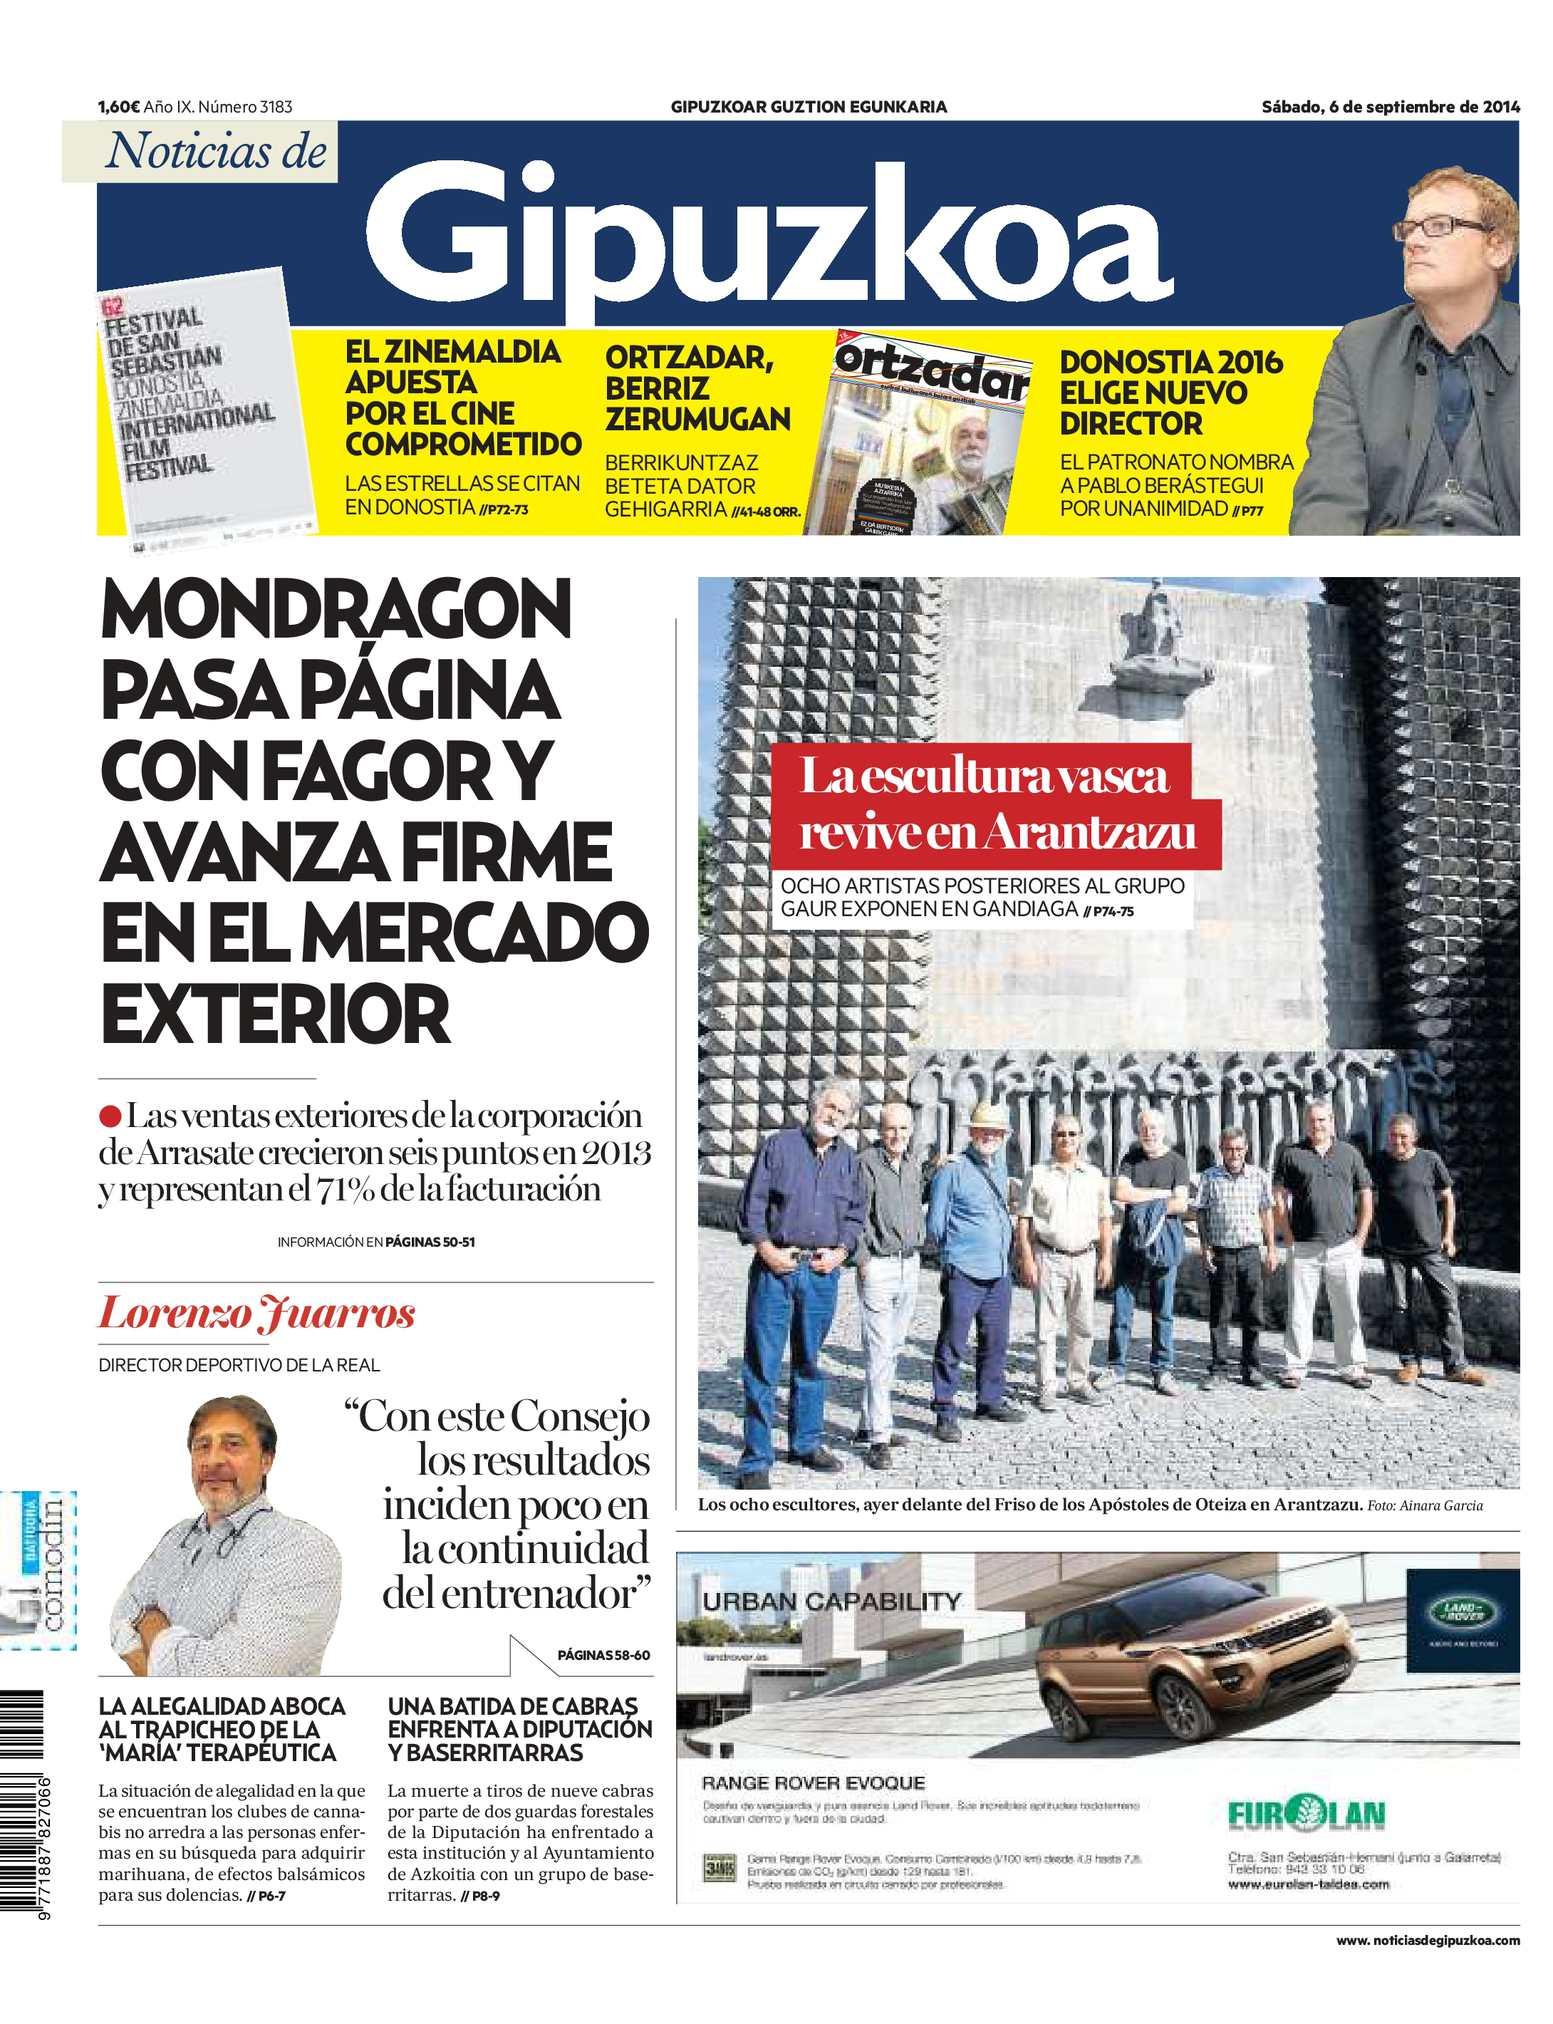 65f6e29f59 Calaméo - Noticias de Gipuzkoa 20140906